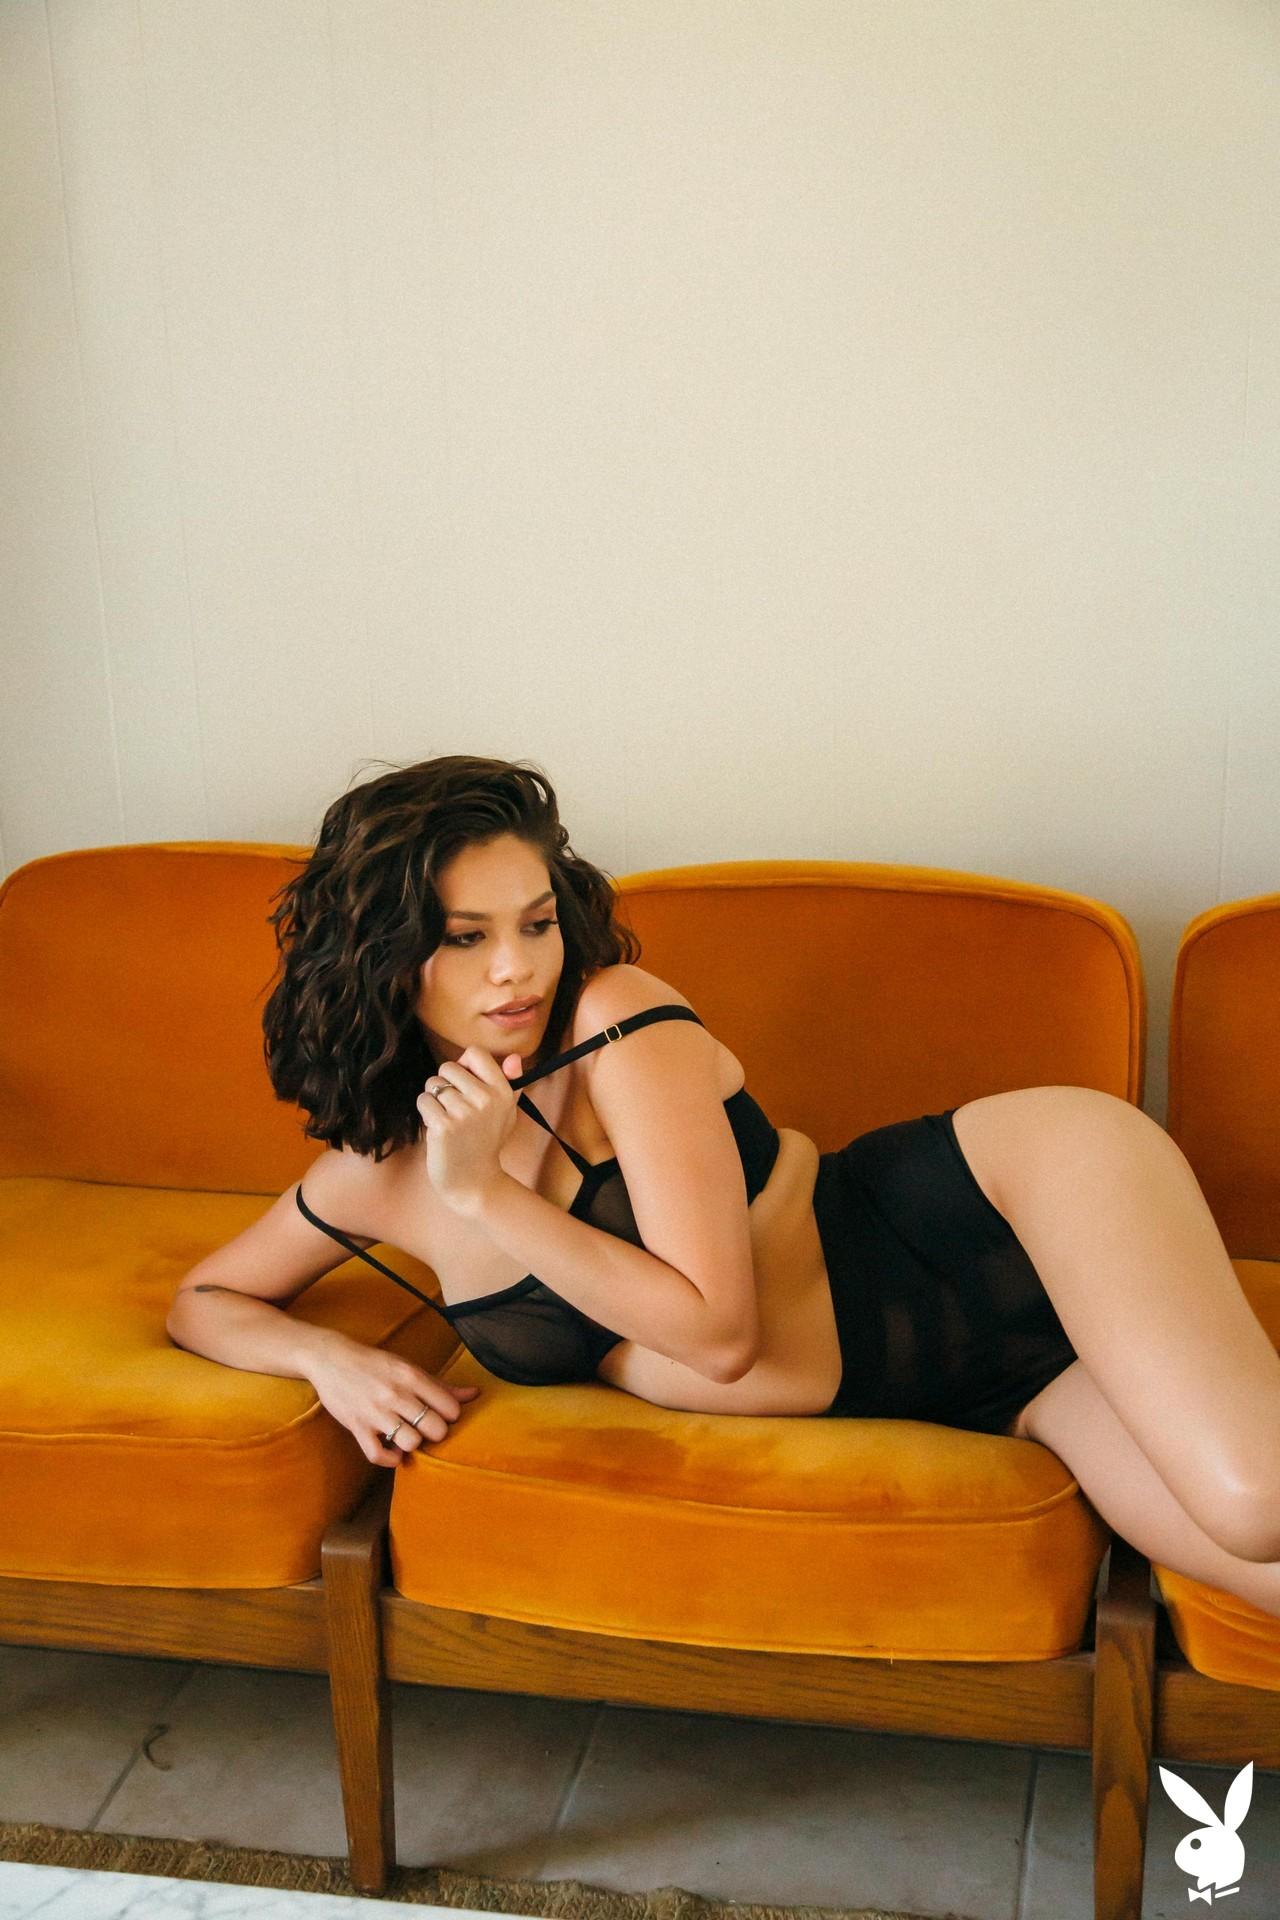 Natalie Del Real In The Simple Things Playboy Plus (7)